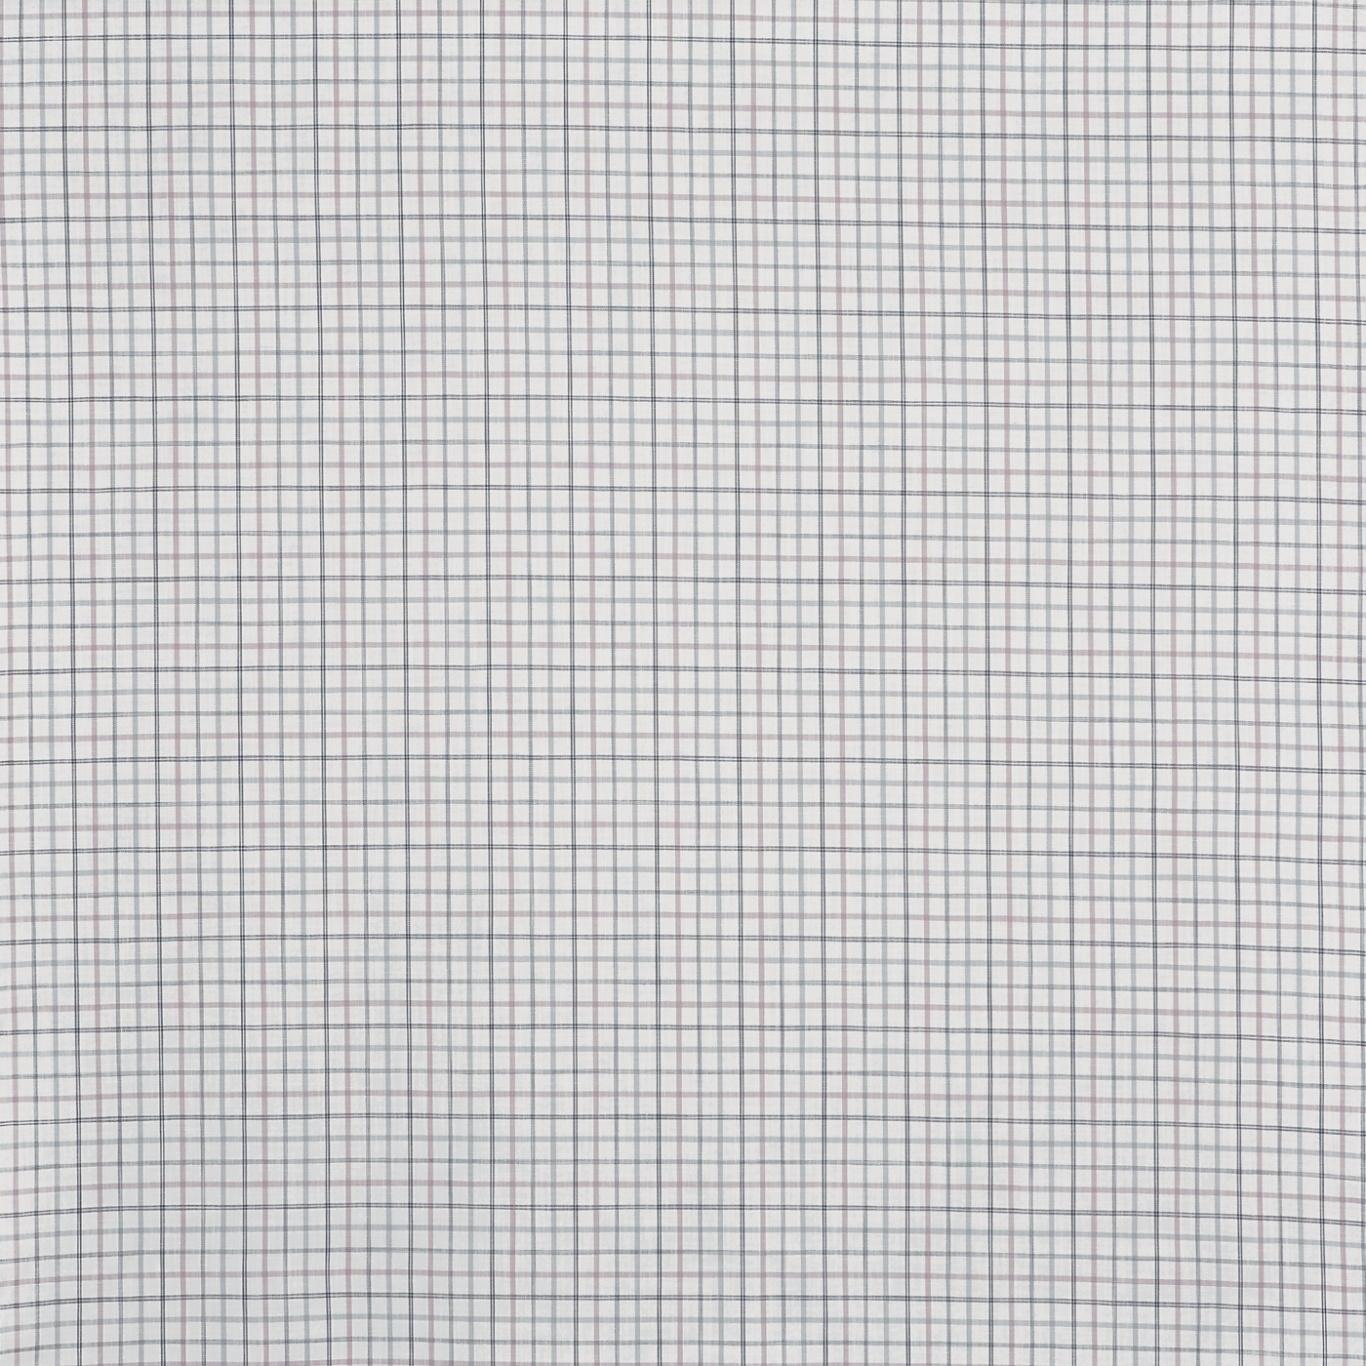 Image of Prestigious Brunswick Pastel Fabric 3816/220